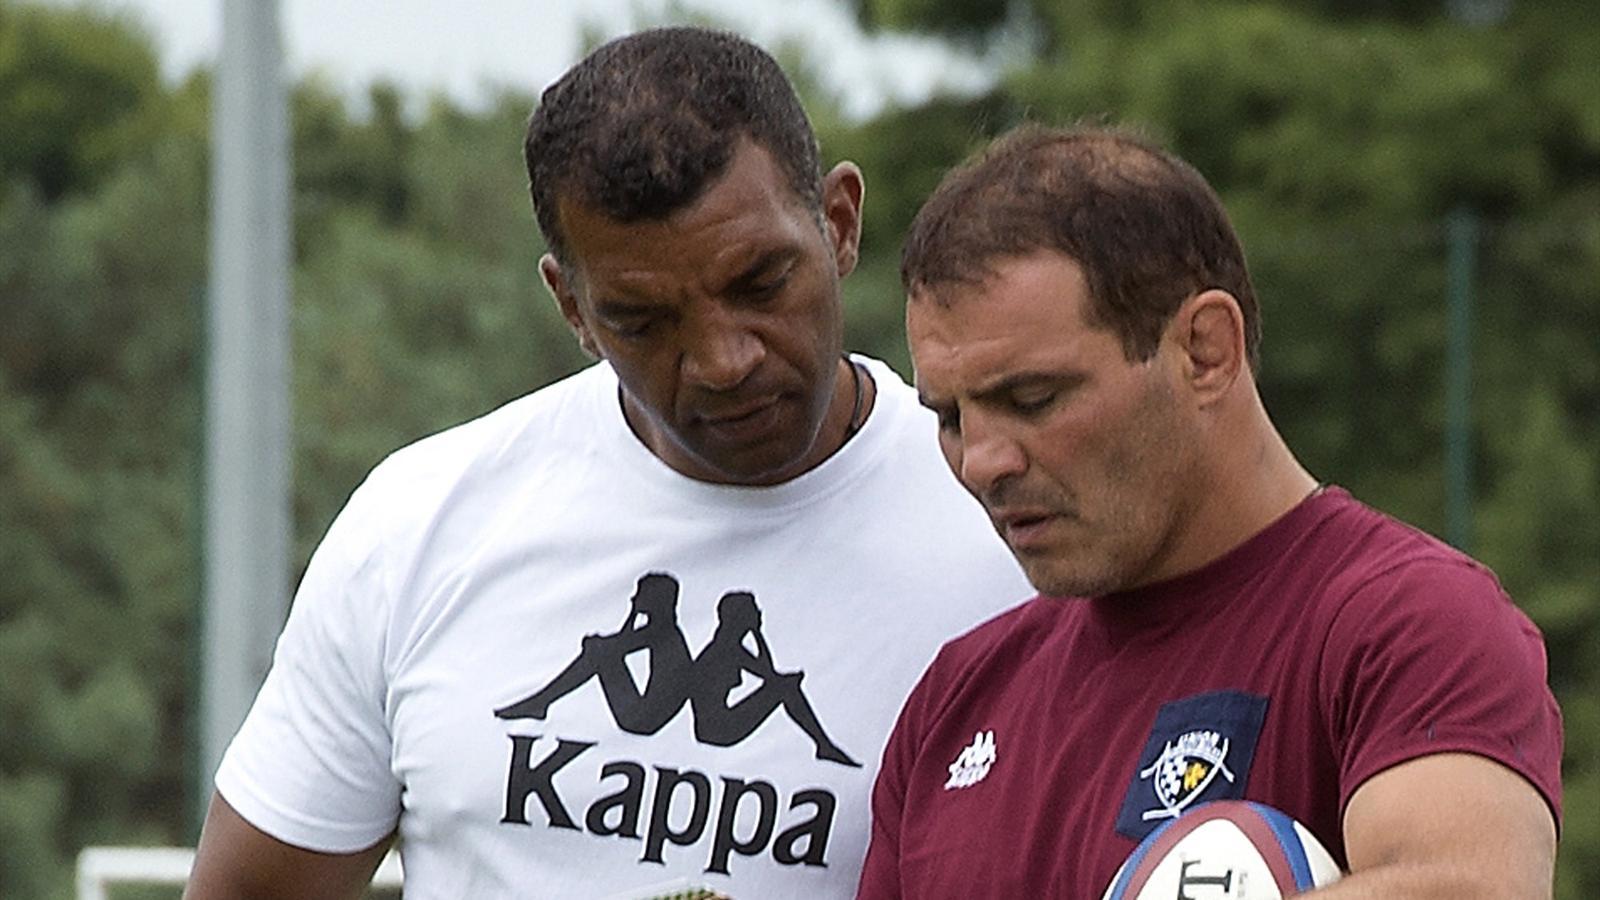 Emile Ntamack et Raphaël Ibanez (Bordeaux-Bègles) - 4 août 2015